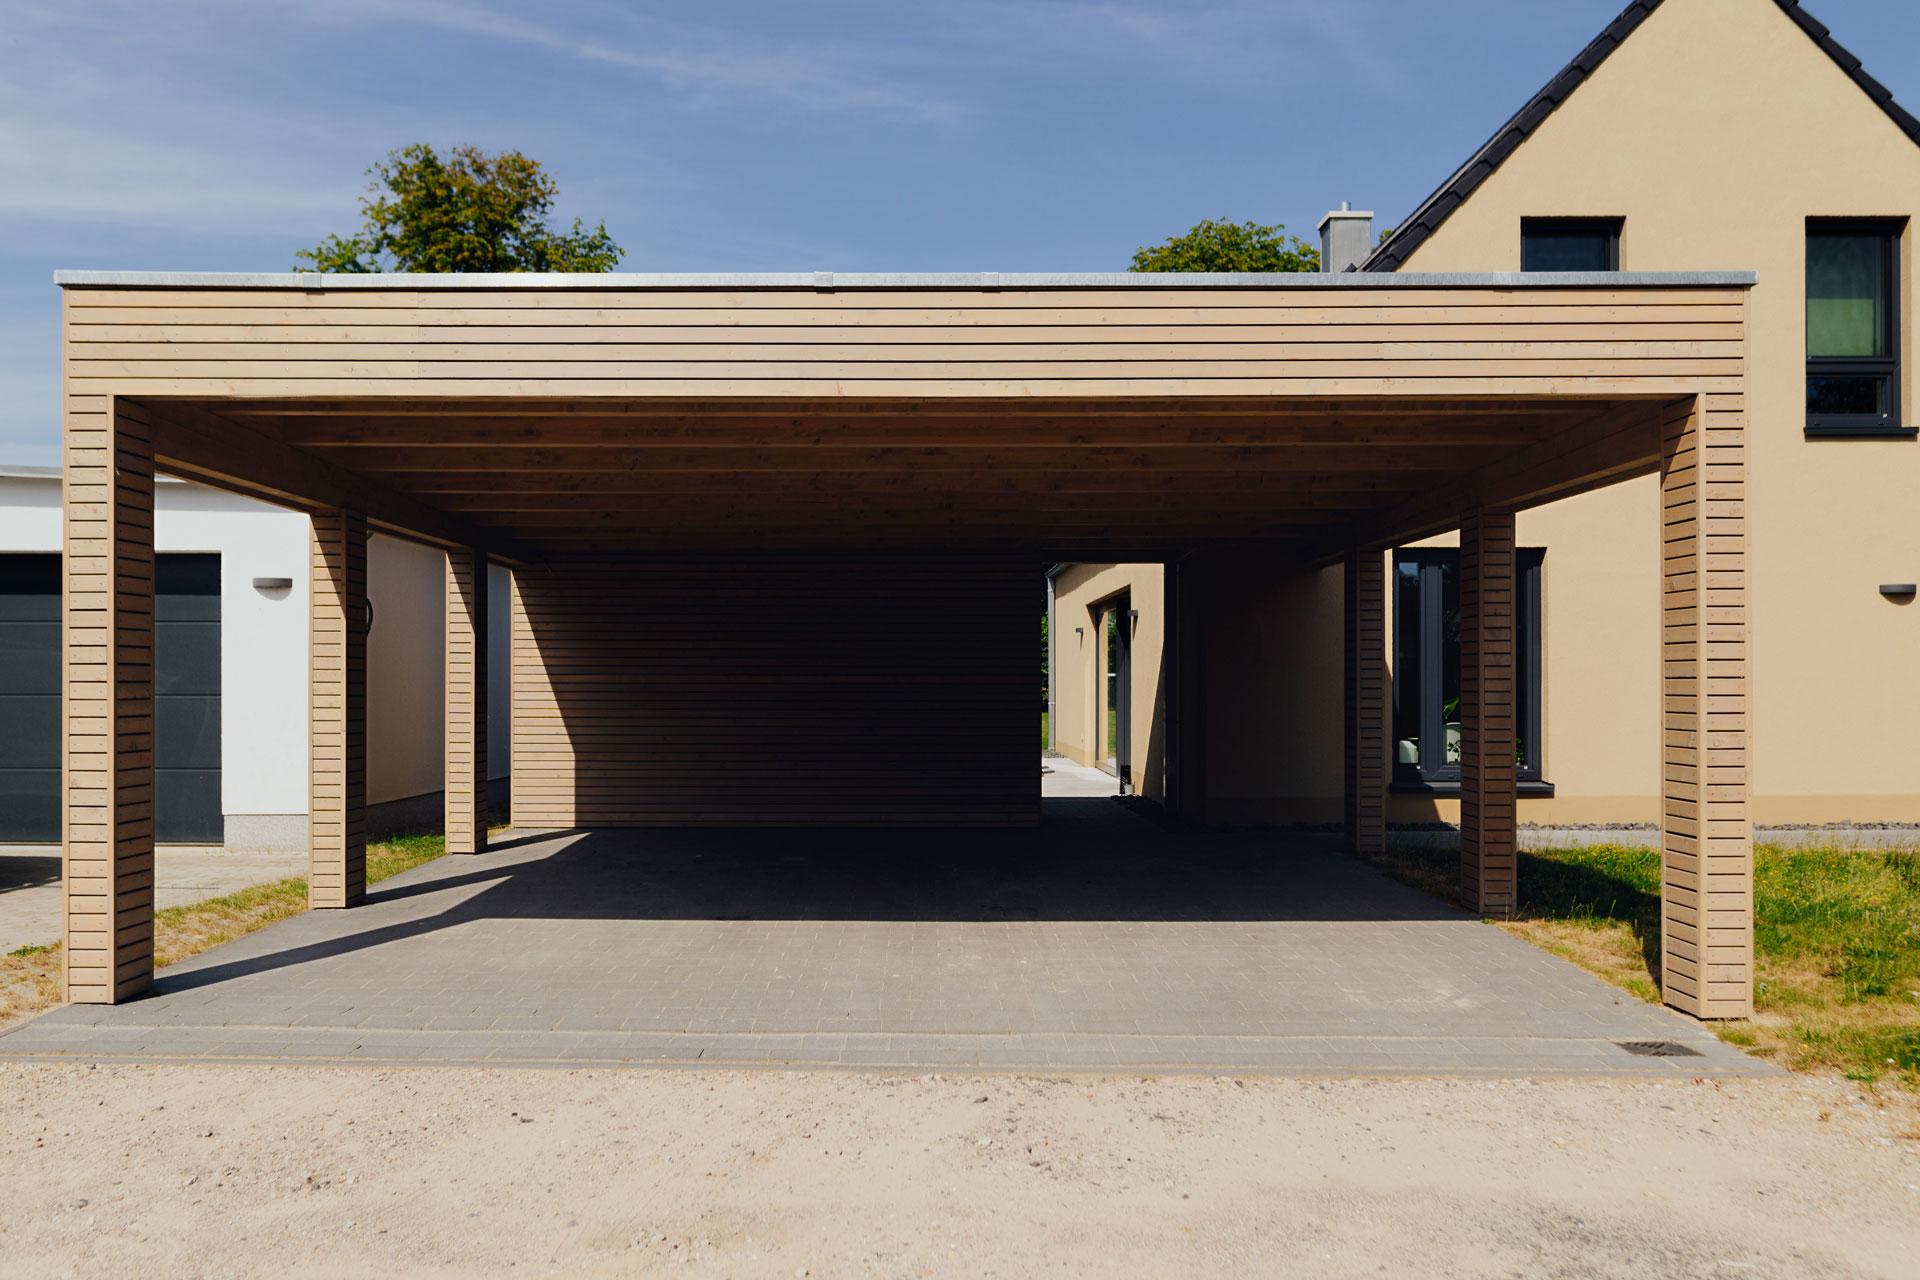 Carport in Wismar (02) / Totale seitlich